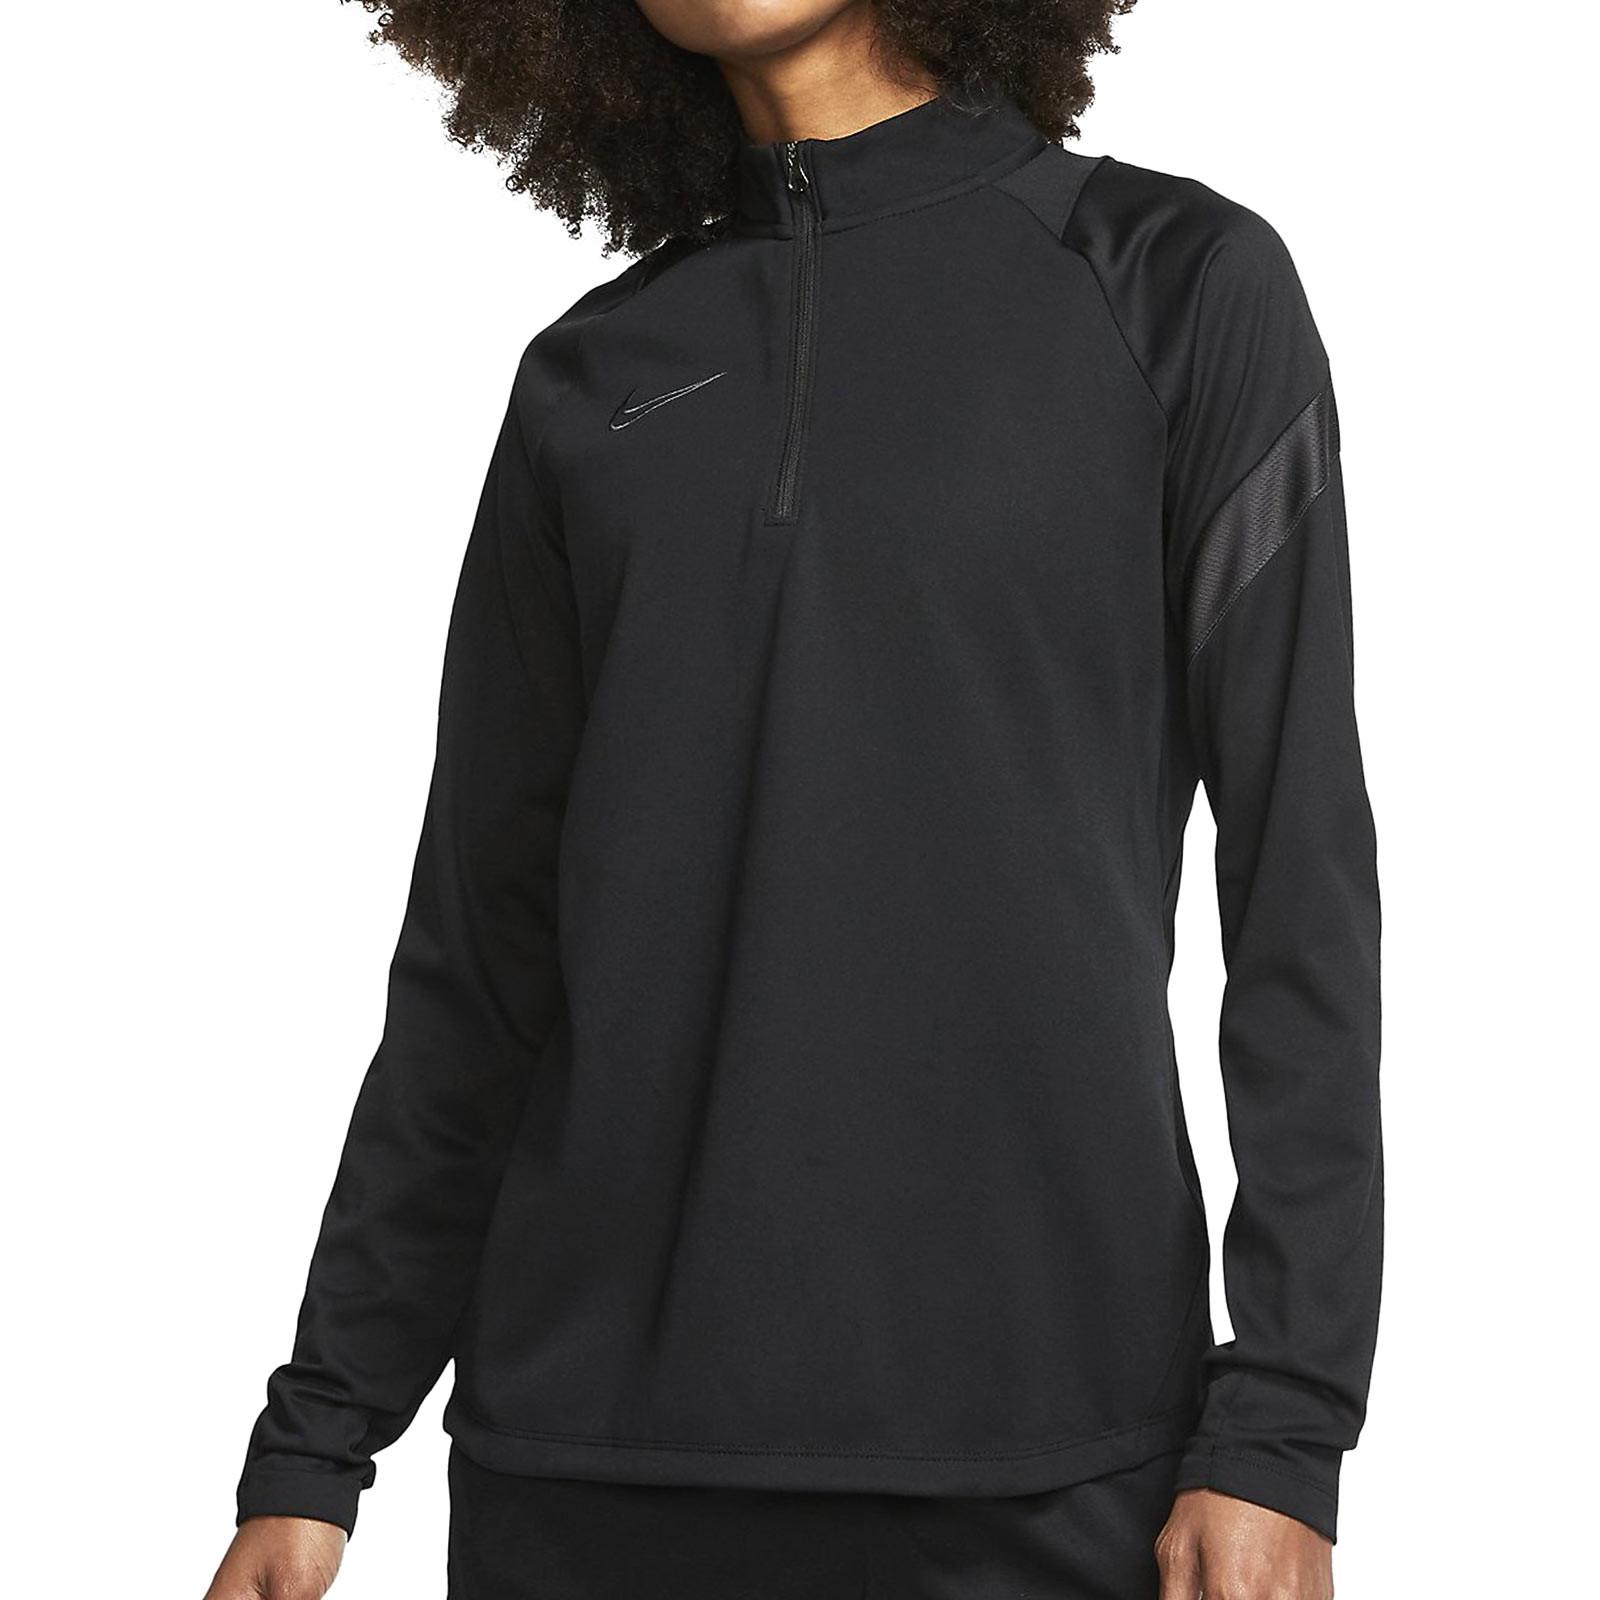 proporcionar Ennegrecer Exponer  Sudadera Nike mujer Dry Academy Pro negra | futbolmania